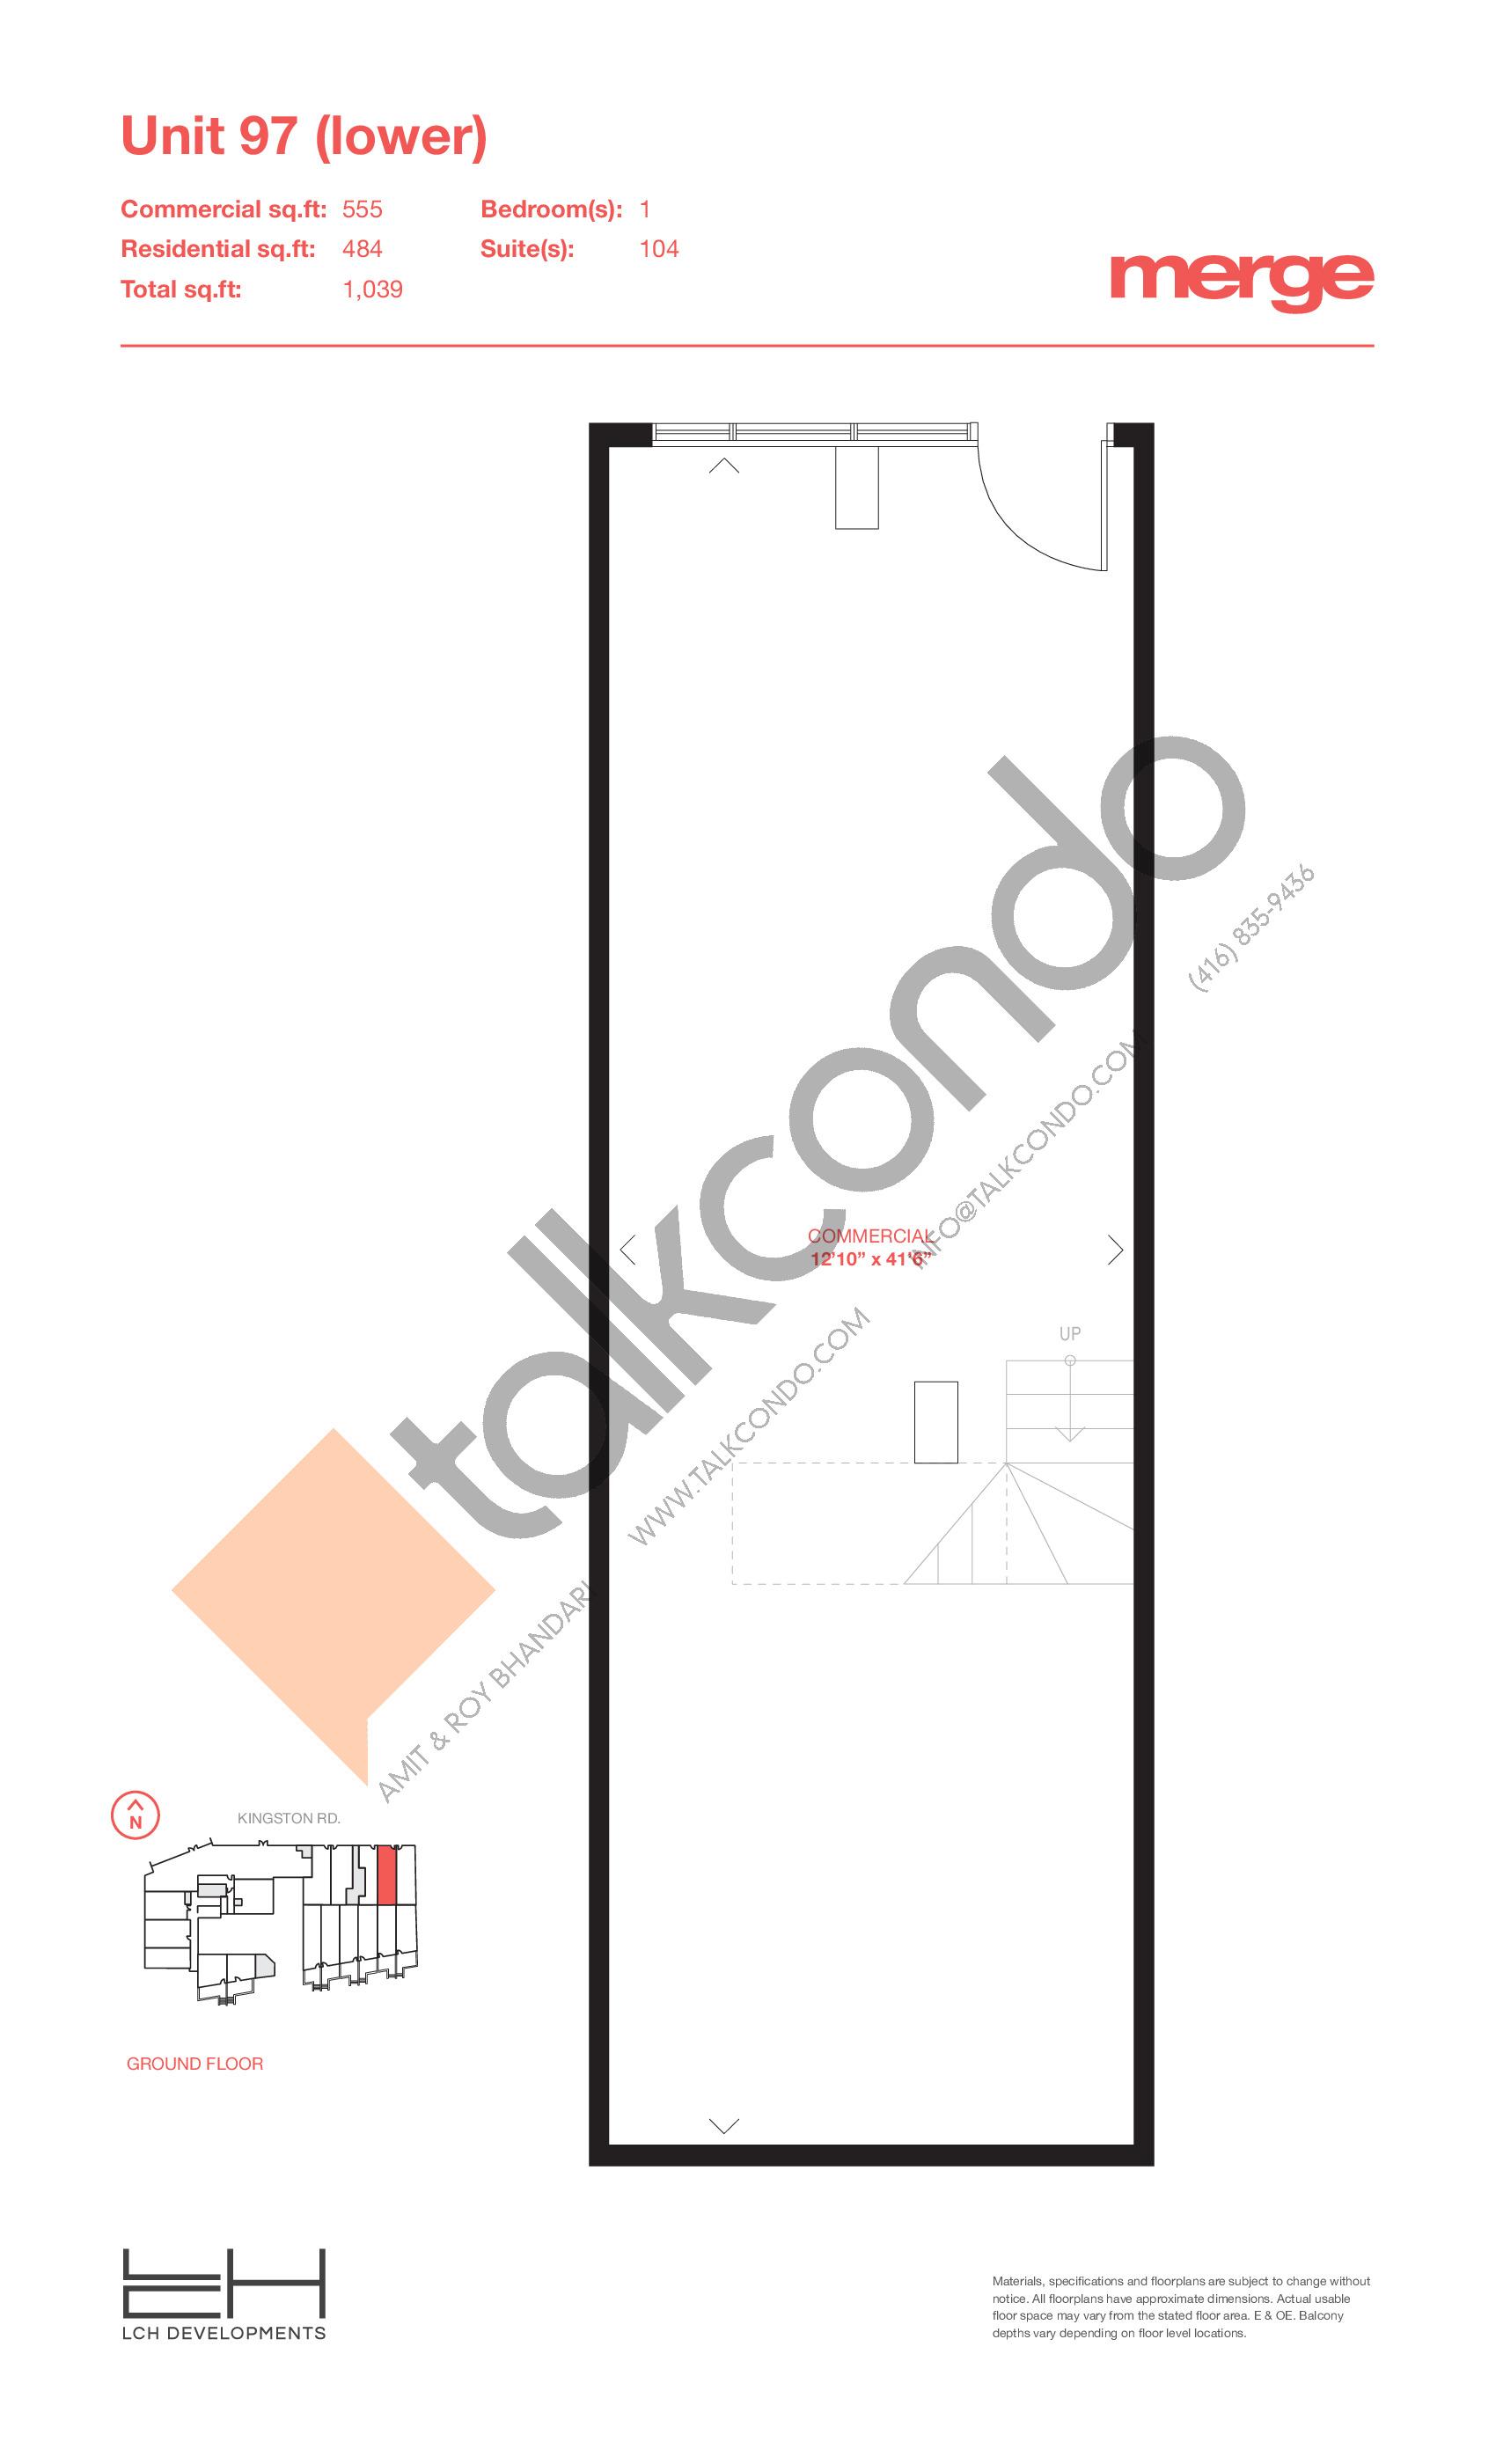 Unit 97 (Lower) - Livework Floor Plan at Merge Condos - 1039 sq.ft